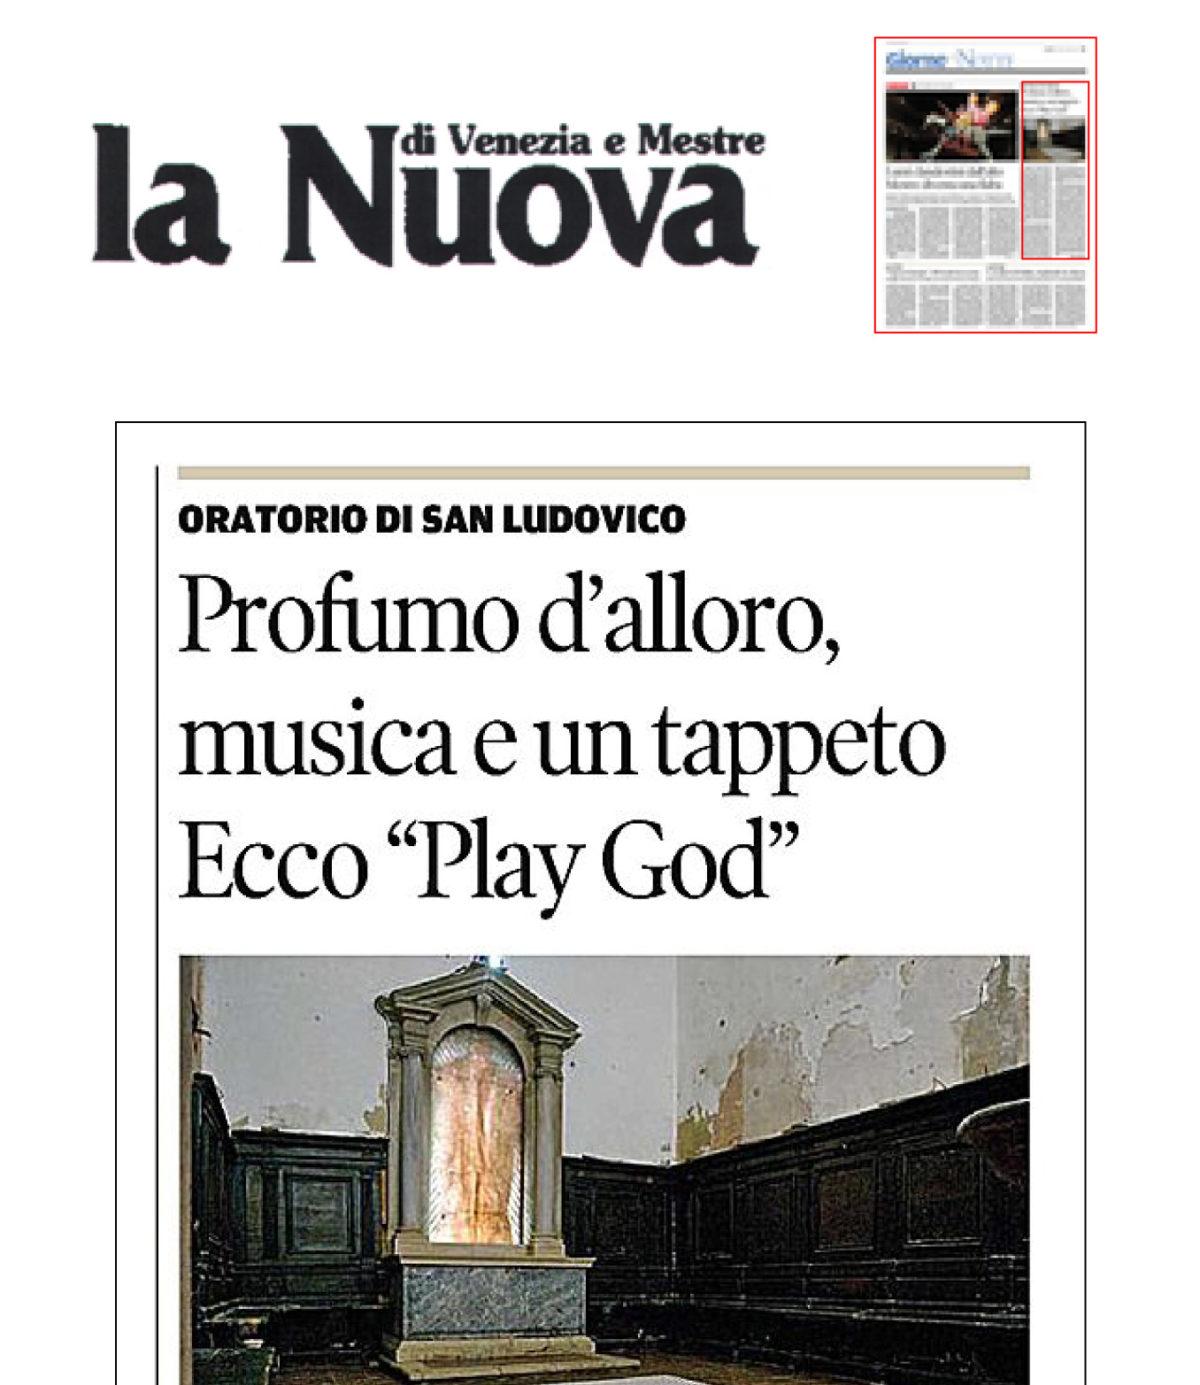 La Nuova Ve 22.05.2014